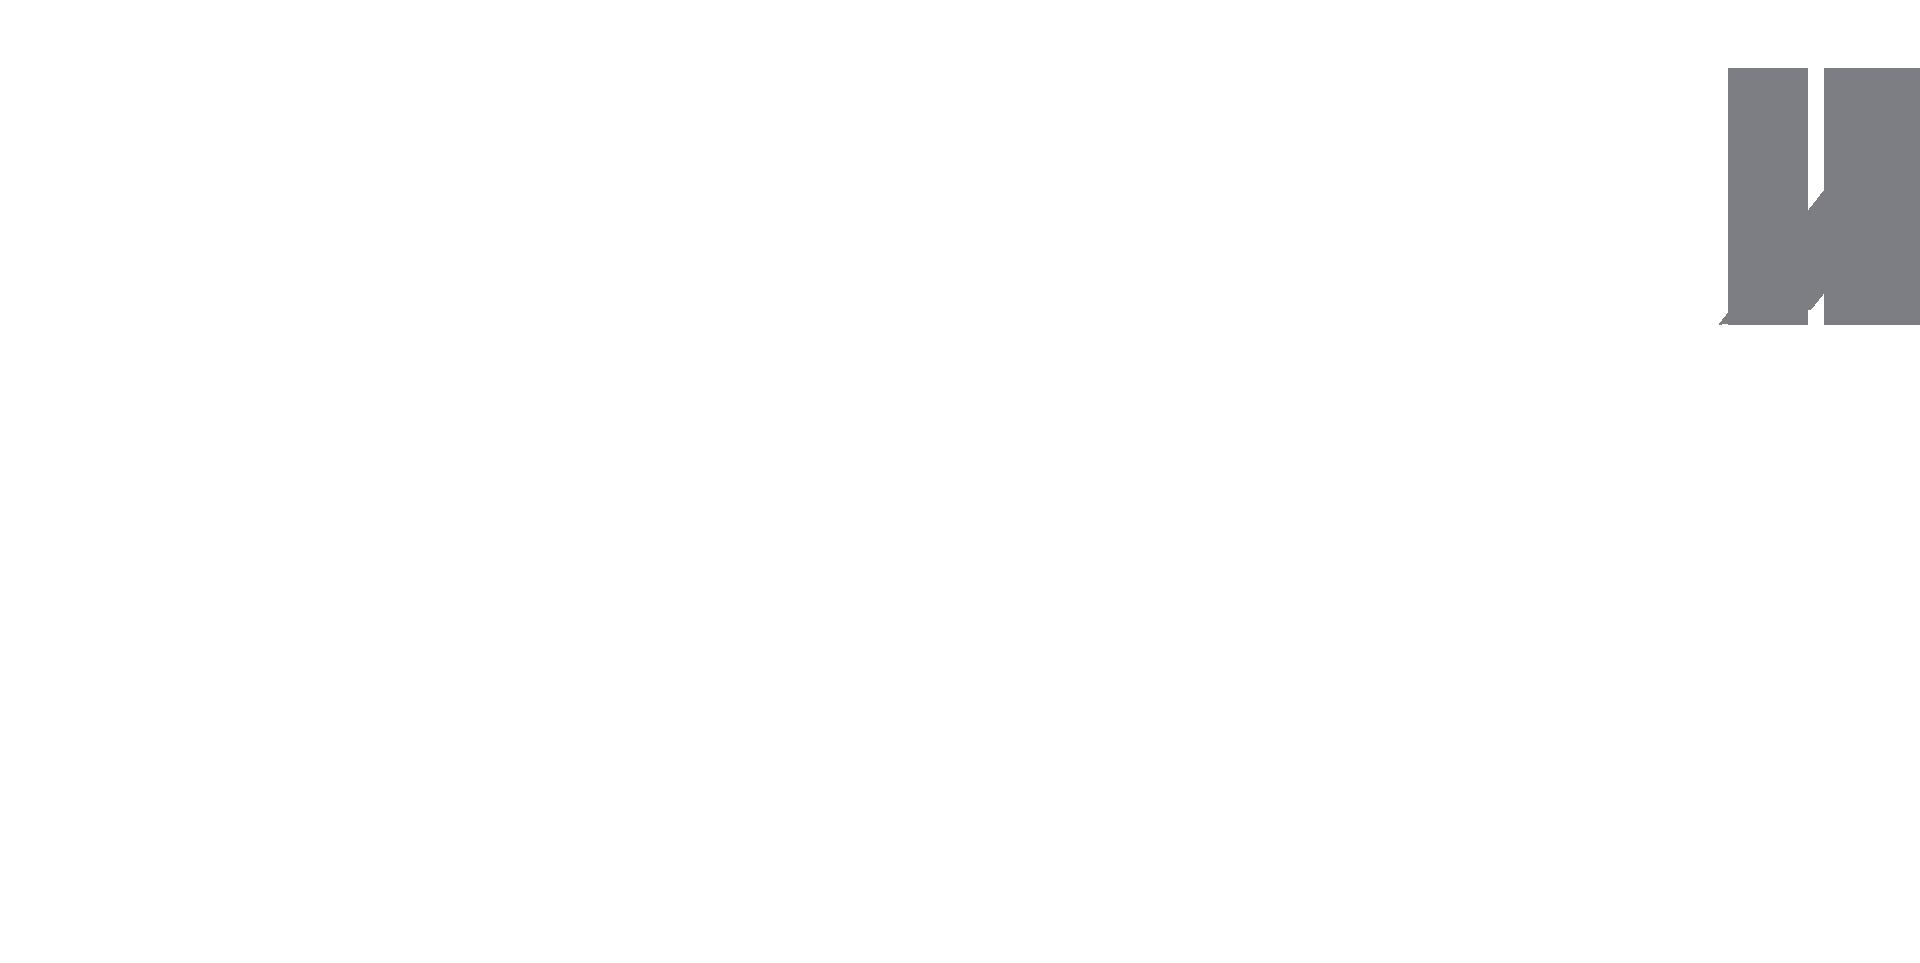 right line